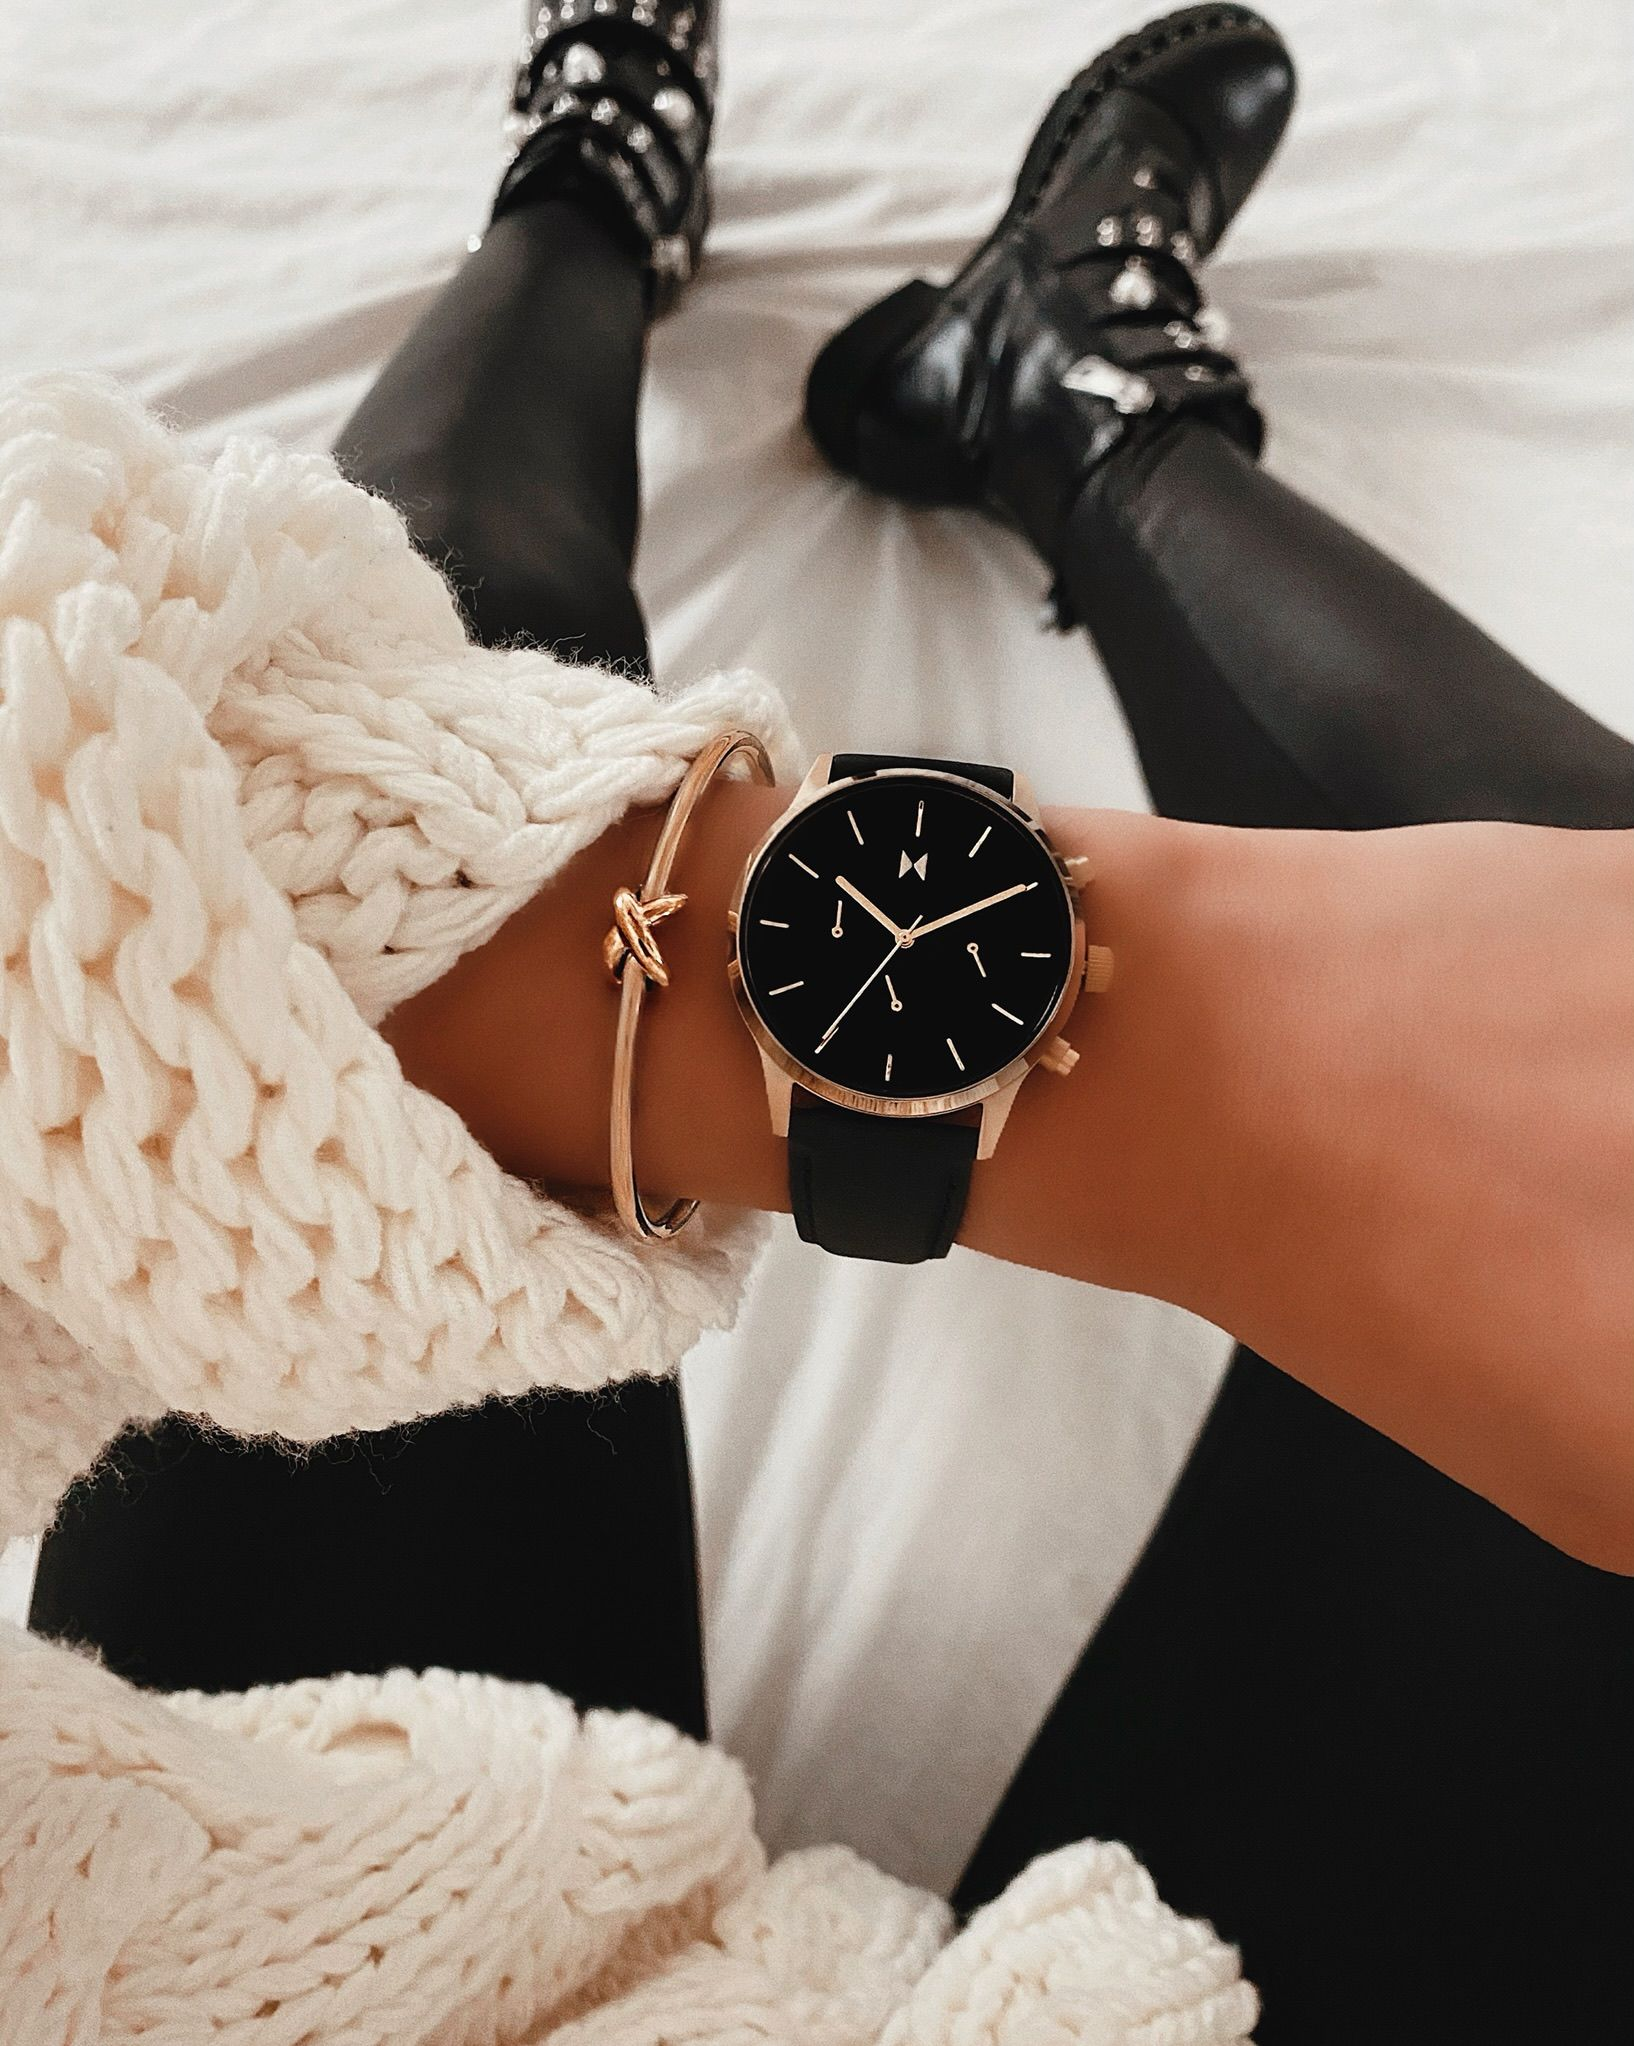 Diana Ladies Dress Watches Watches Women Black Watches Women Leather [ 2046 x 1634 Pixel ]